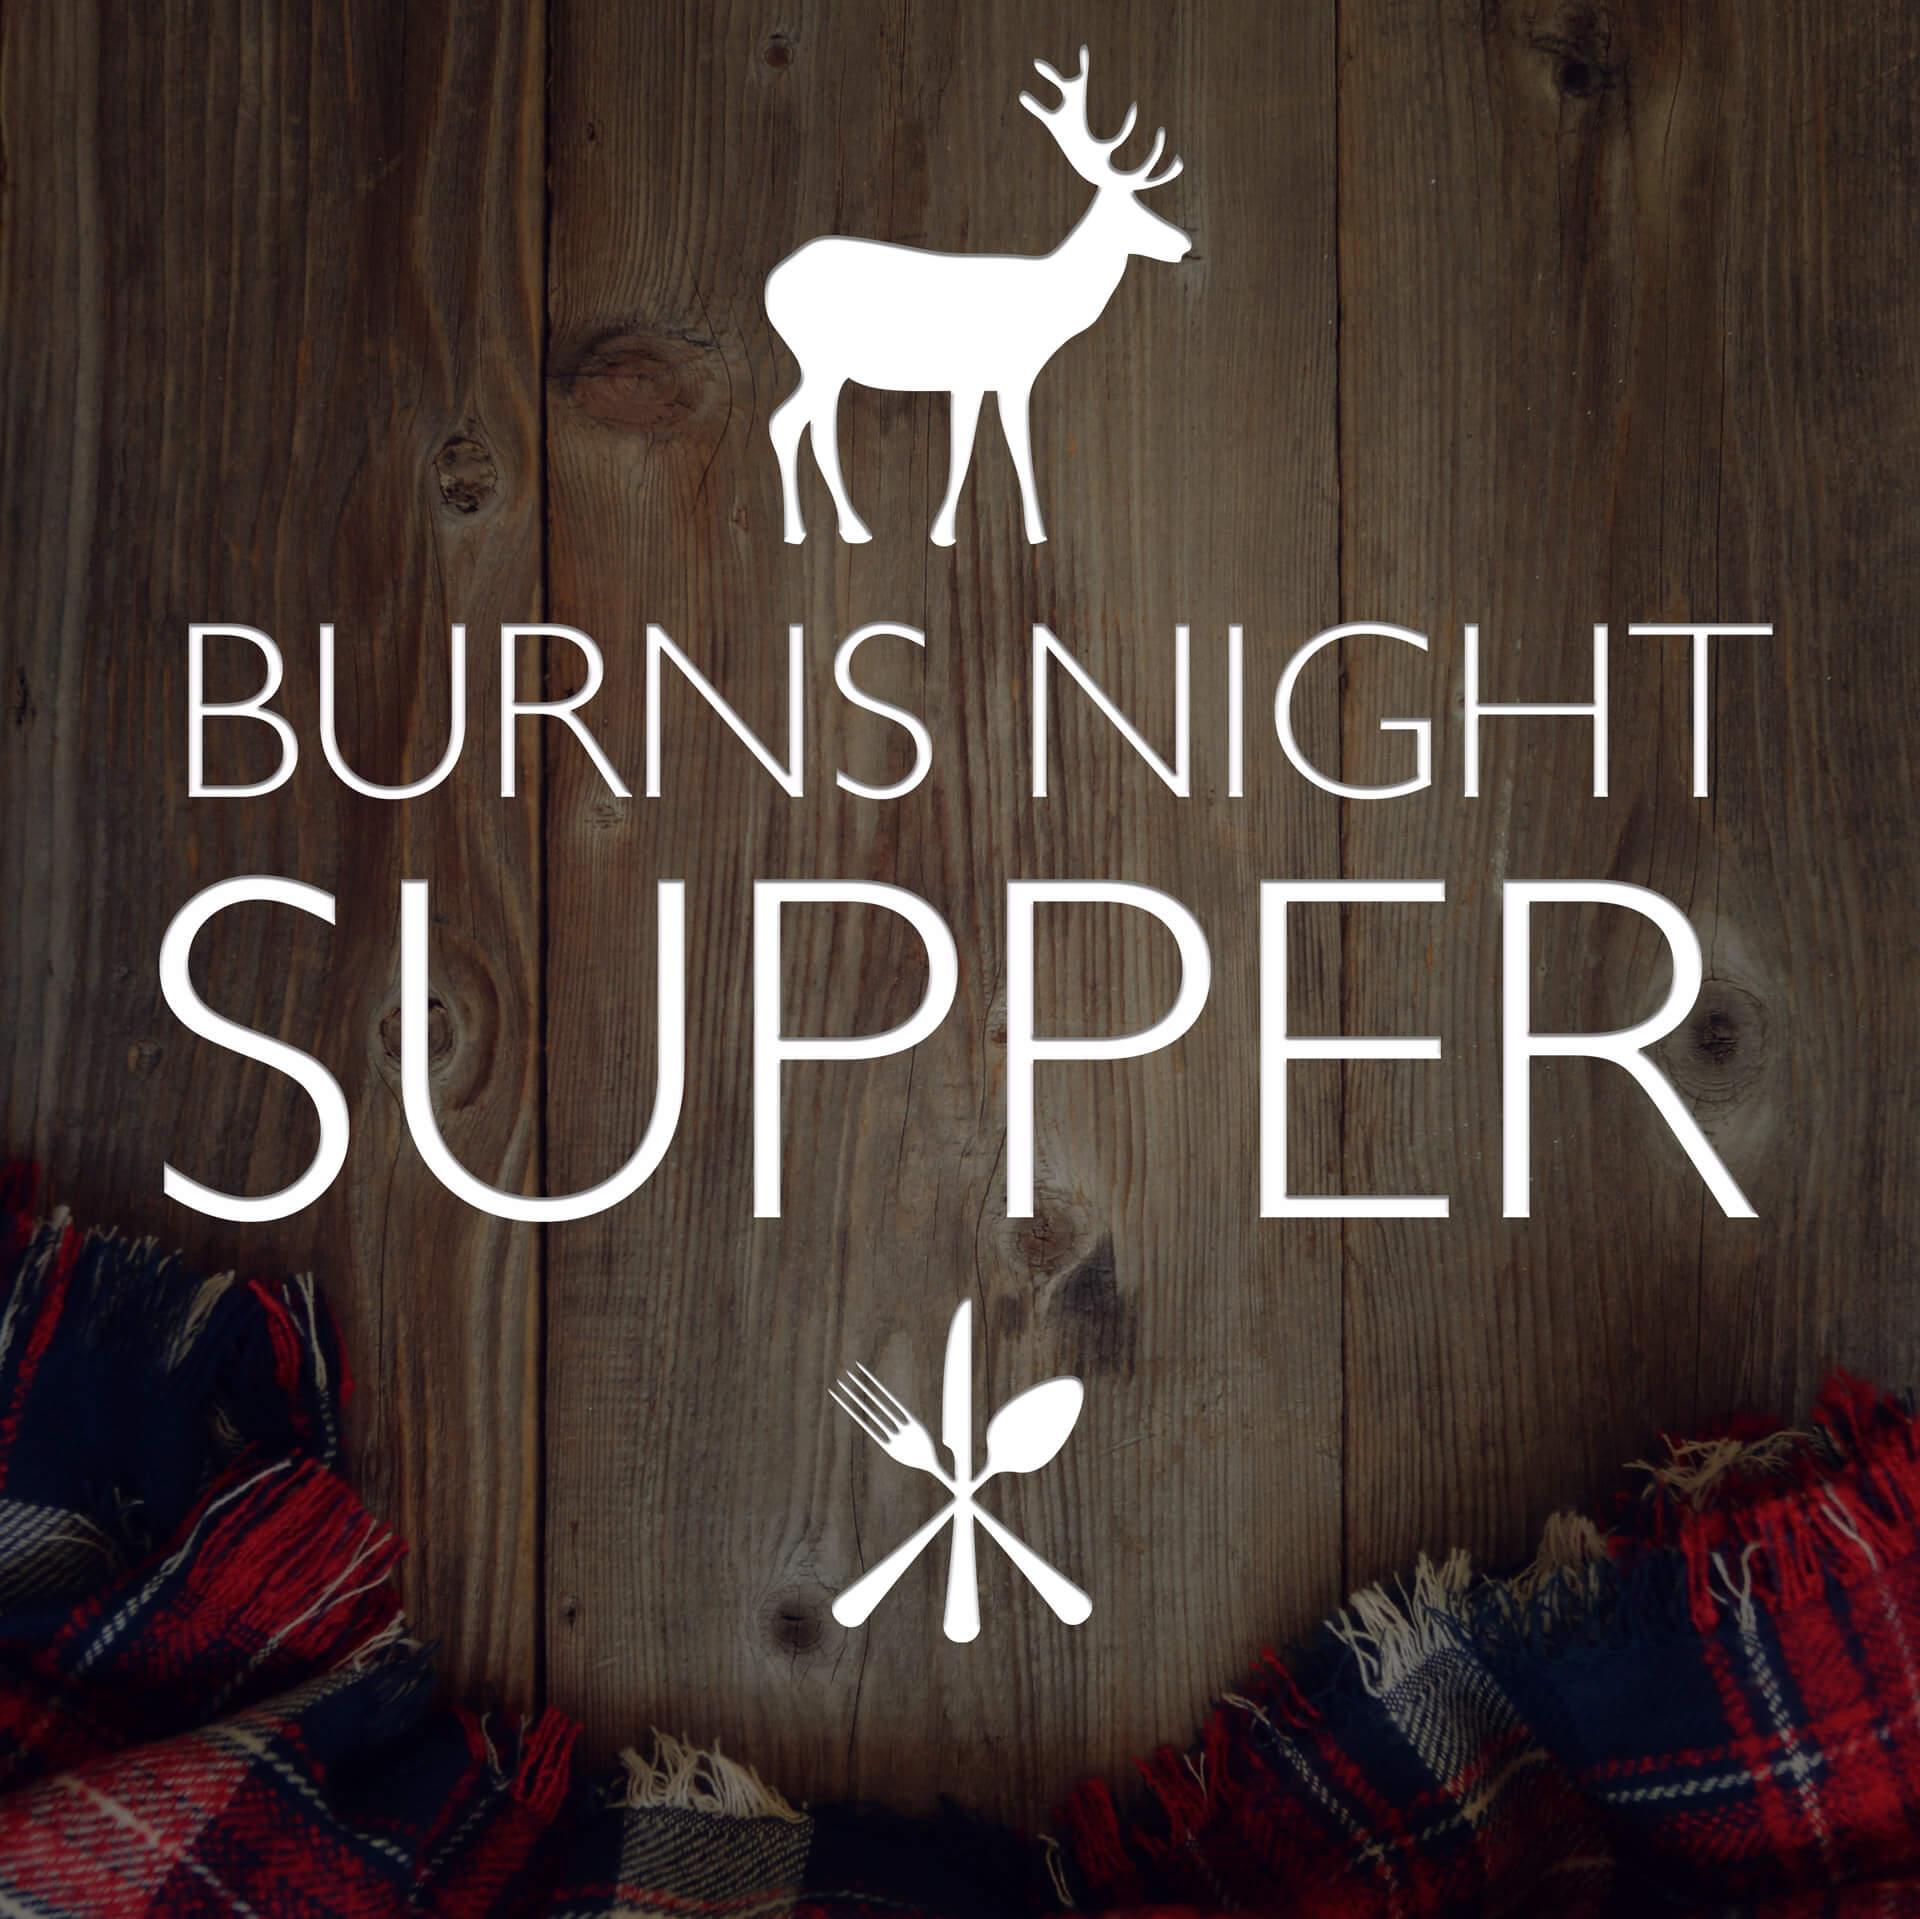 Toast Burns Night With Us - The White Hart Hotel Dartmoor